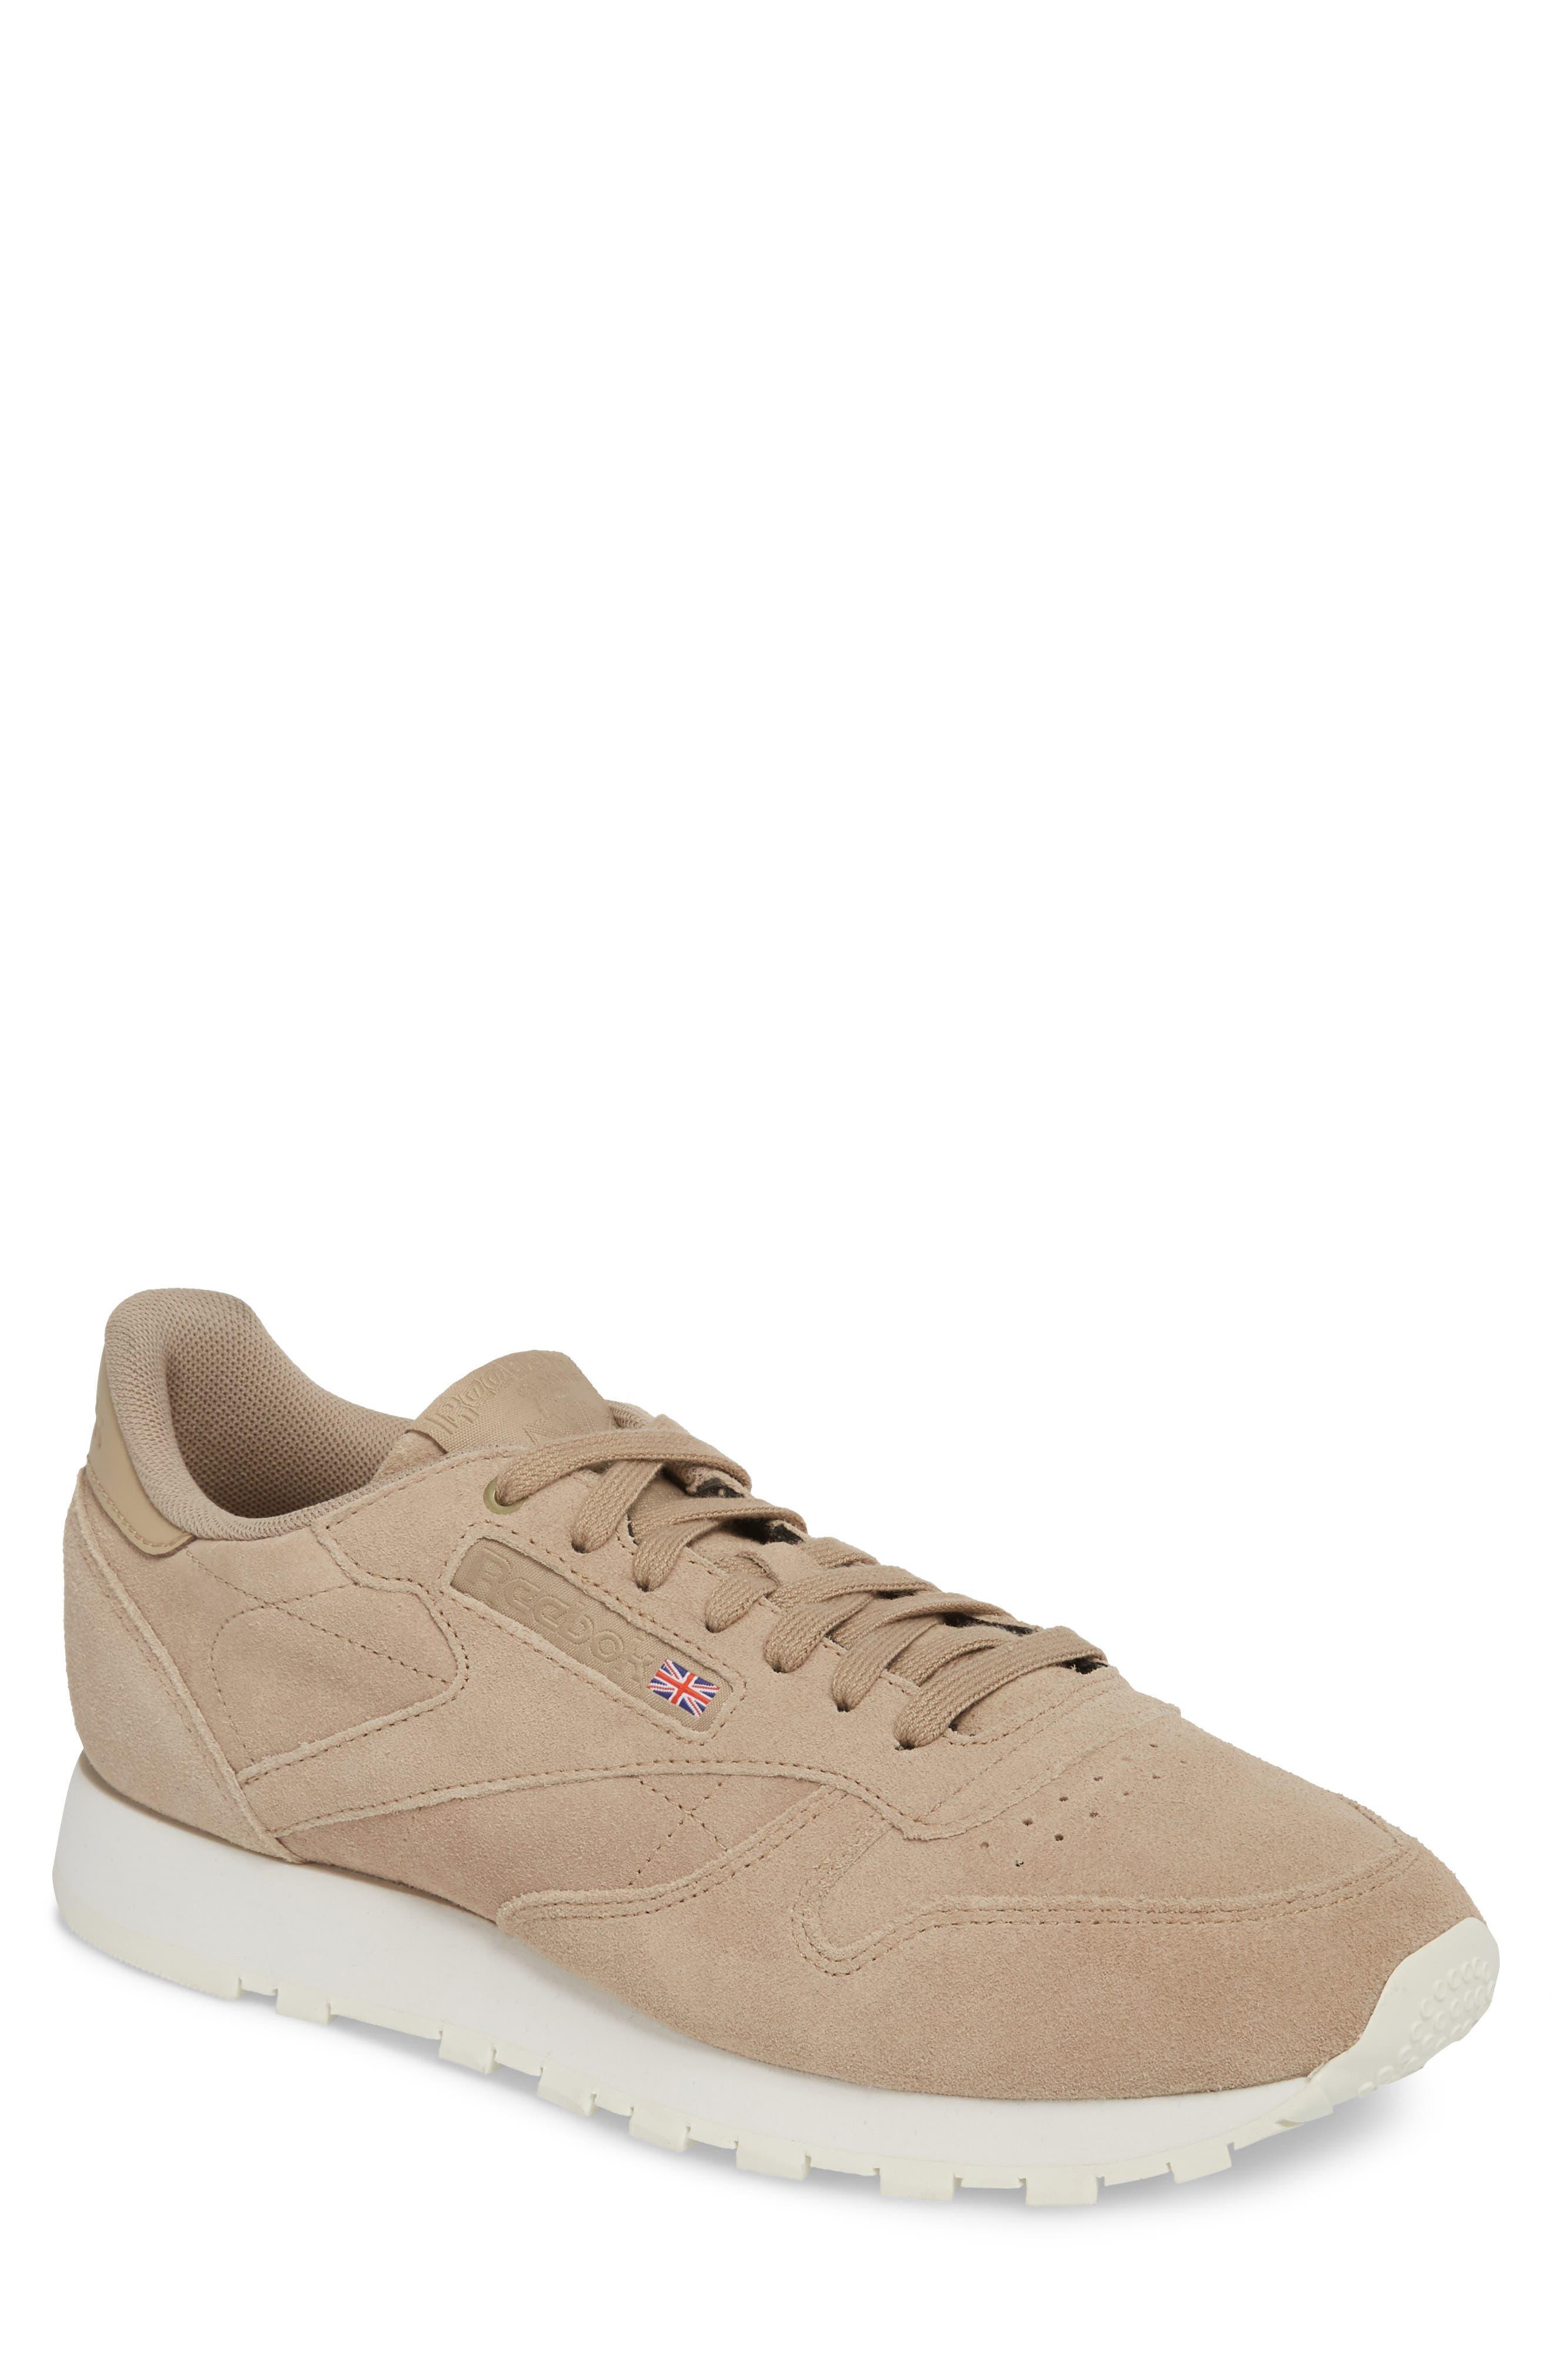 Classic Leather Low Top Sneaker,                             Main thumbnail 1, color,                             Duck Season/ Chalk